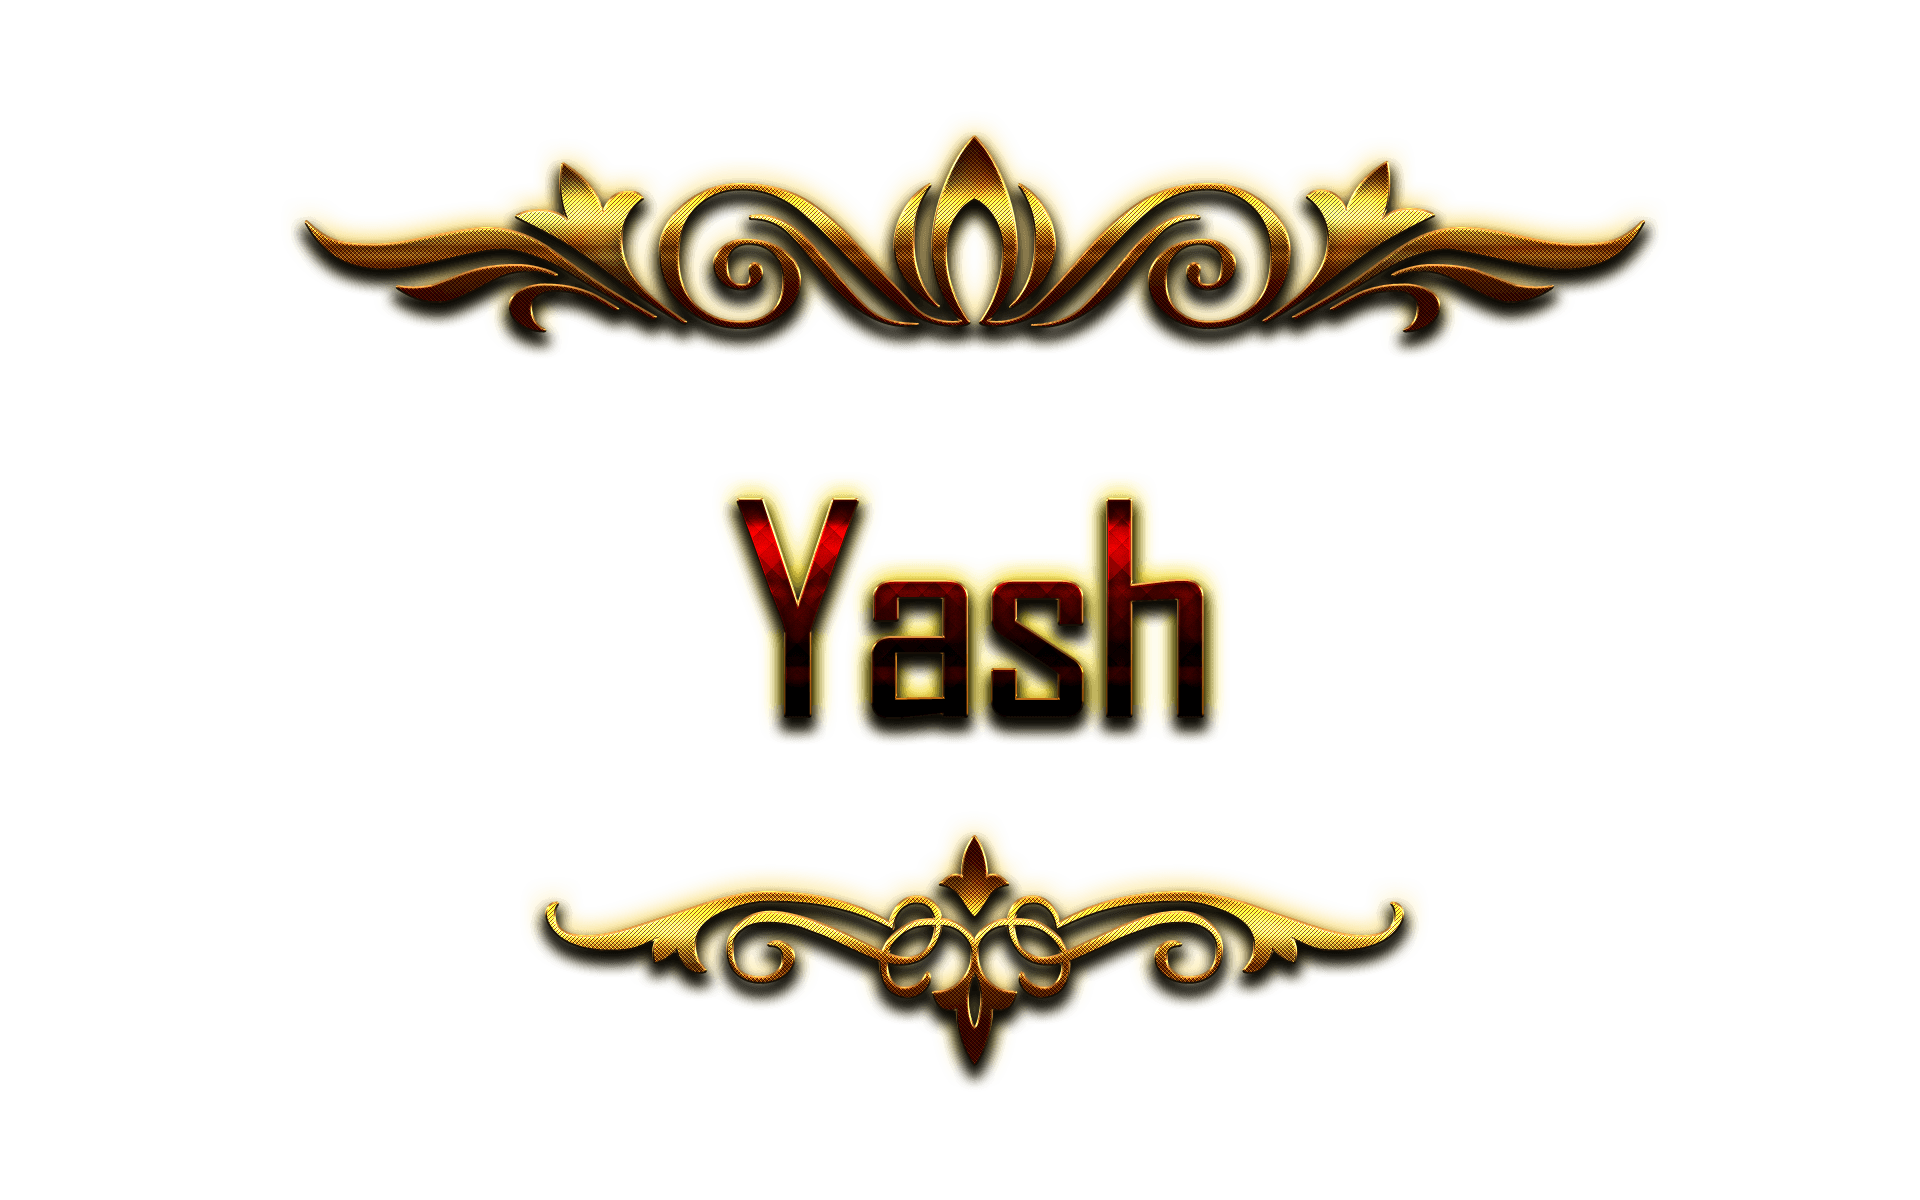 Popular Wallpaper Name Yash - wp2496664  You Should Have_28180.png